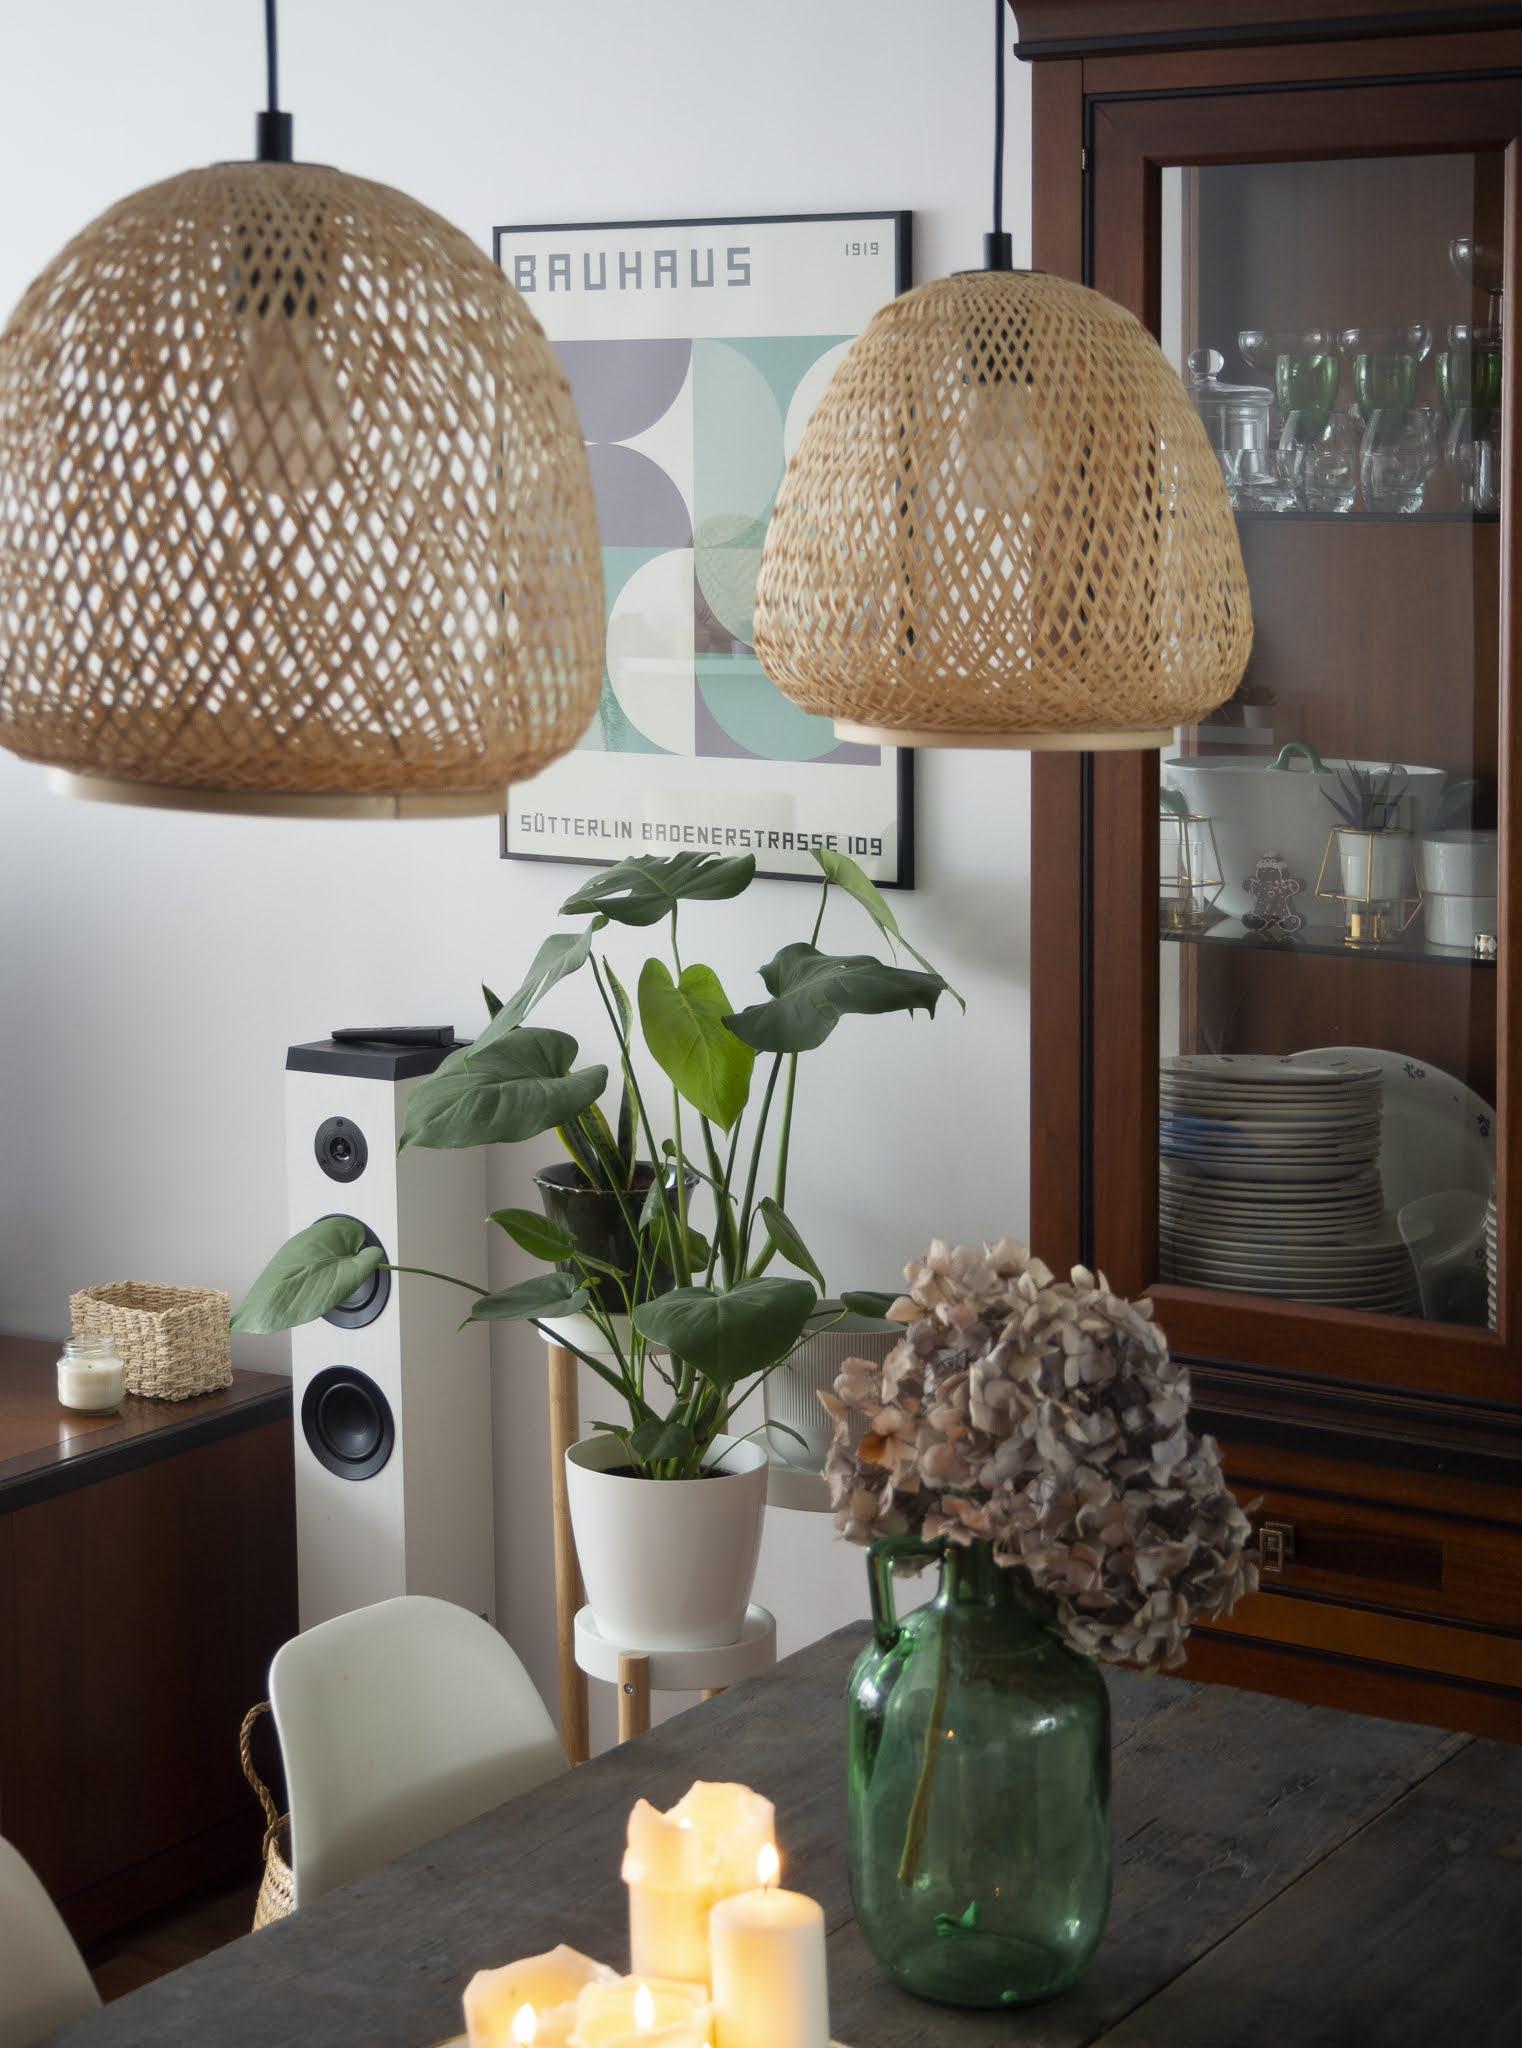 4 trucos para decorar de forma coherente vuestro hogar_4